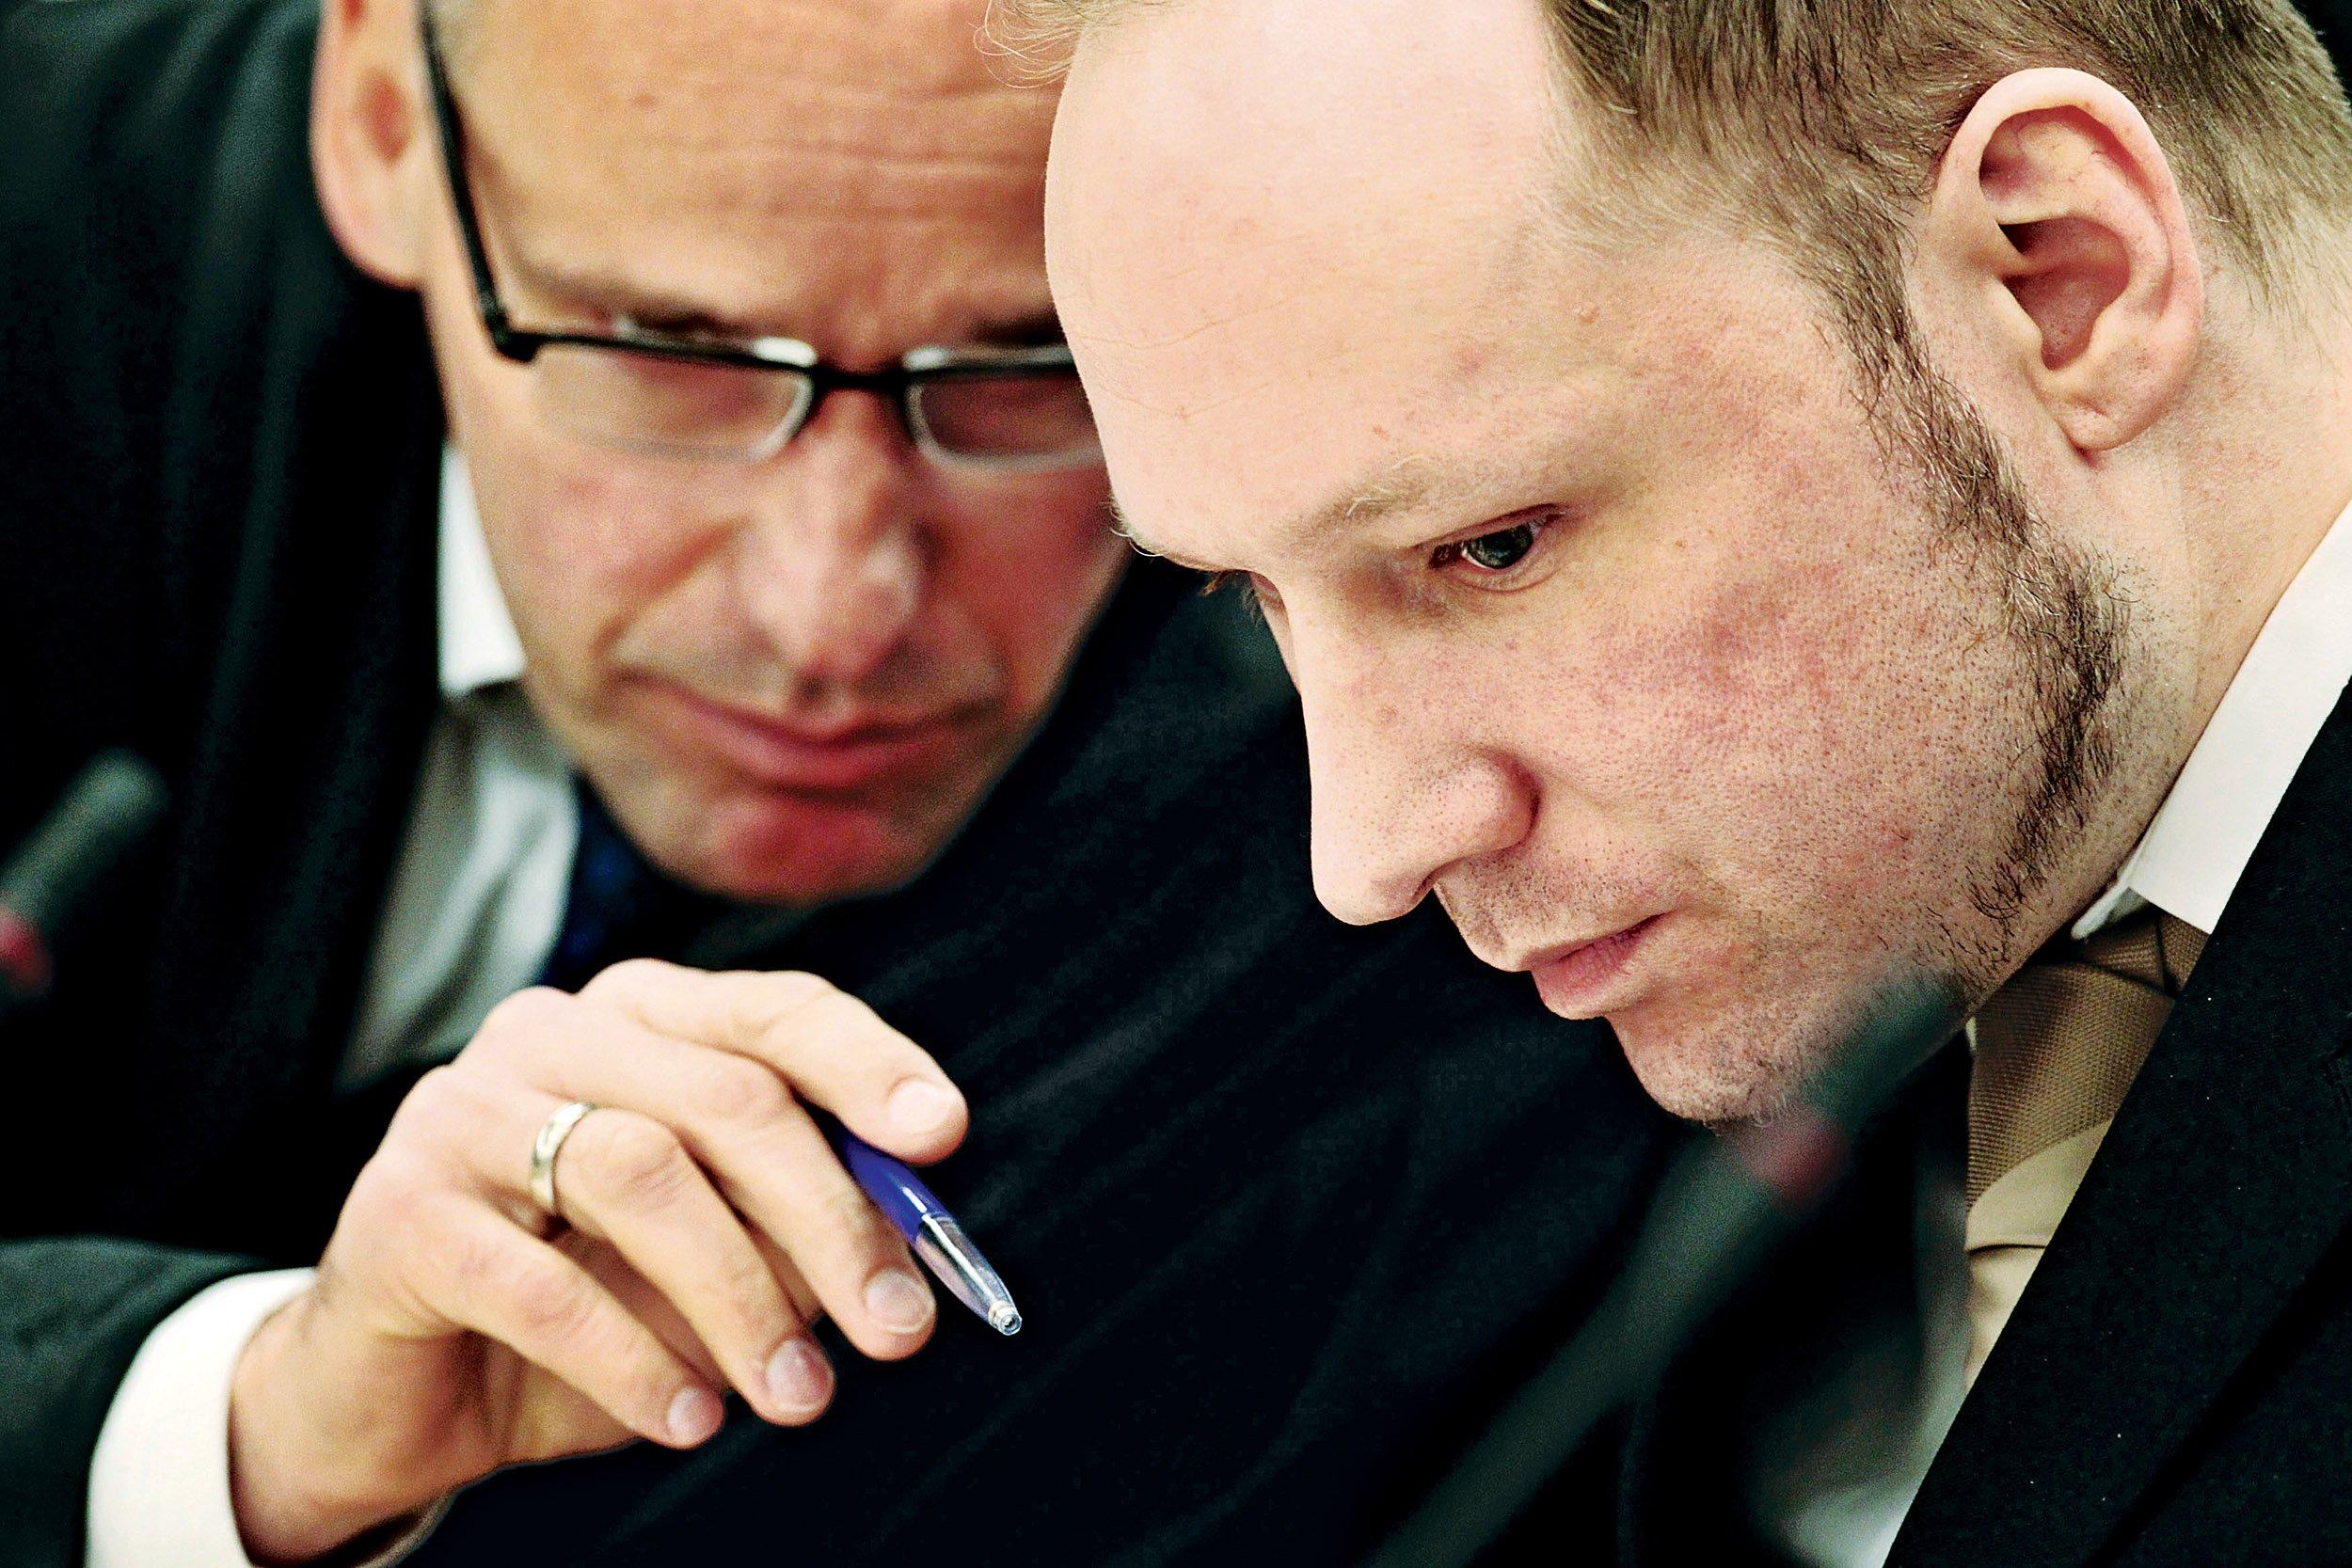 04_22_Breivik_01